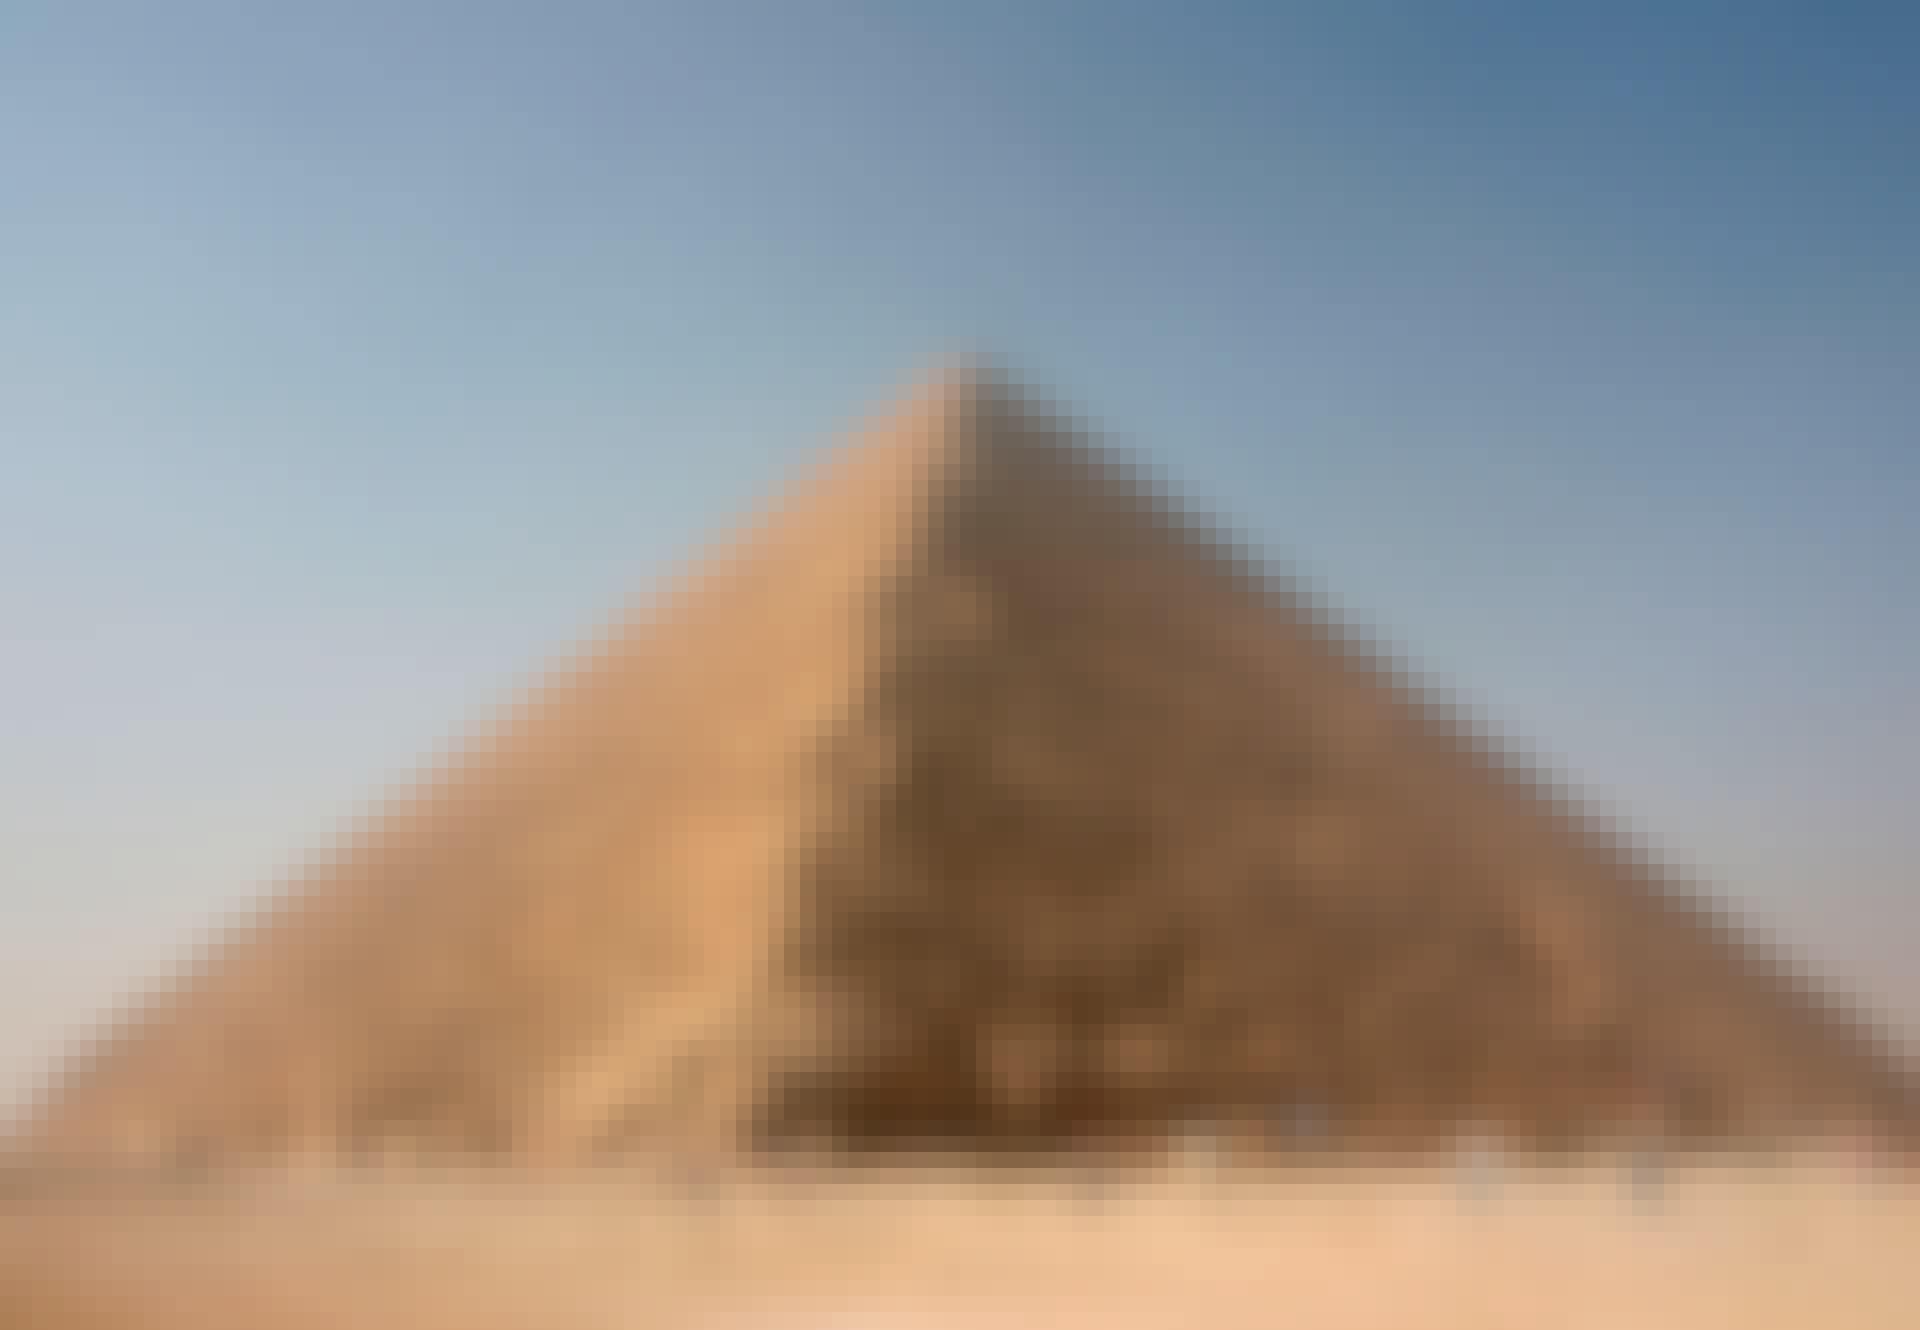 Cheopspyramiden